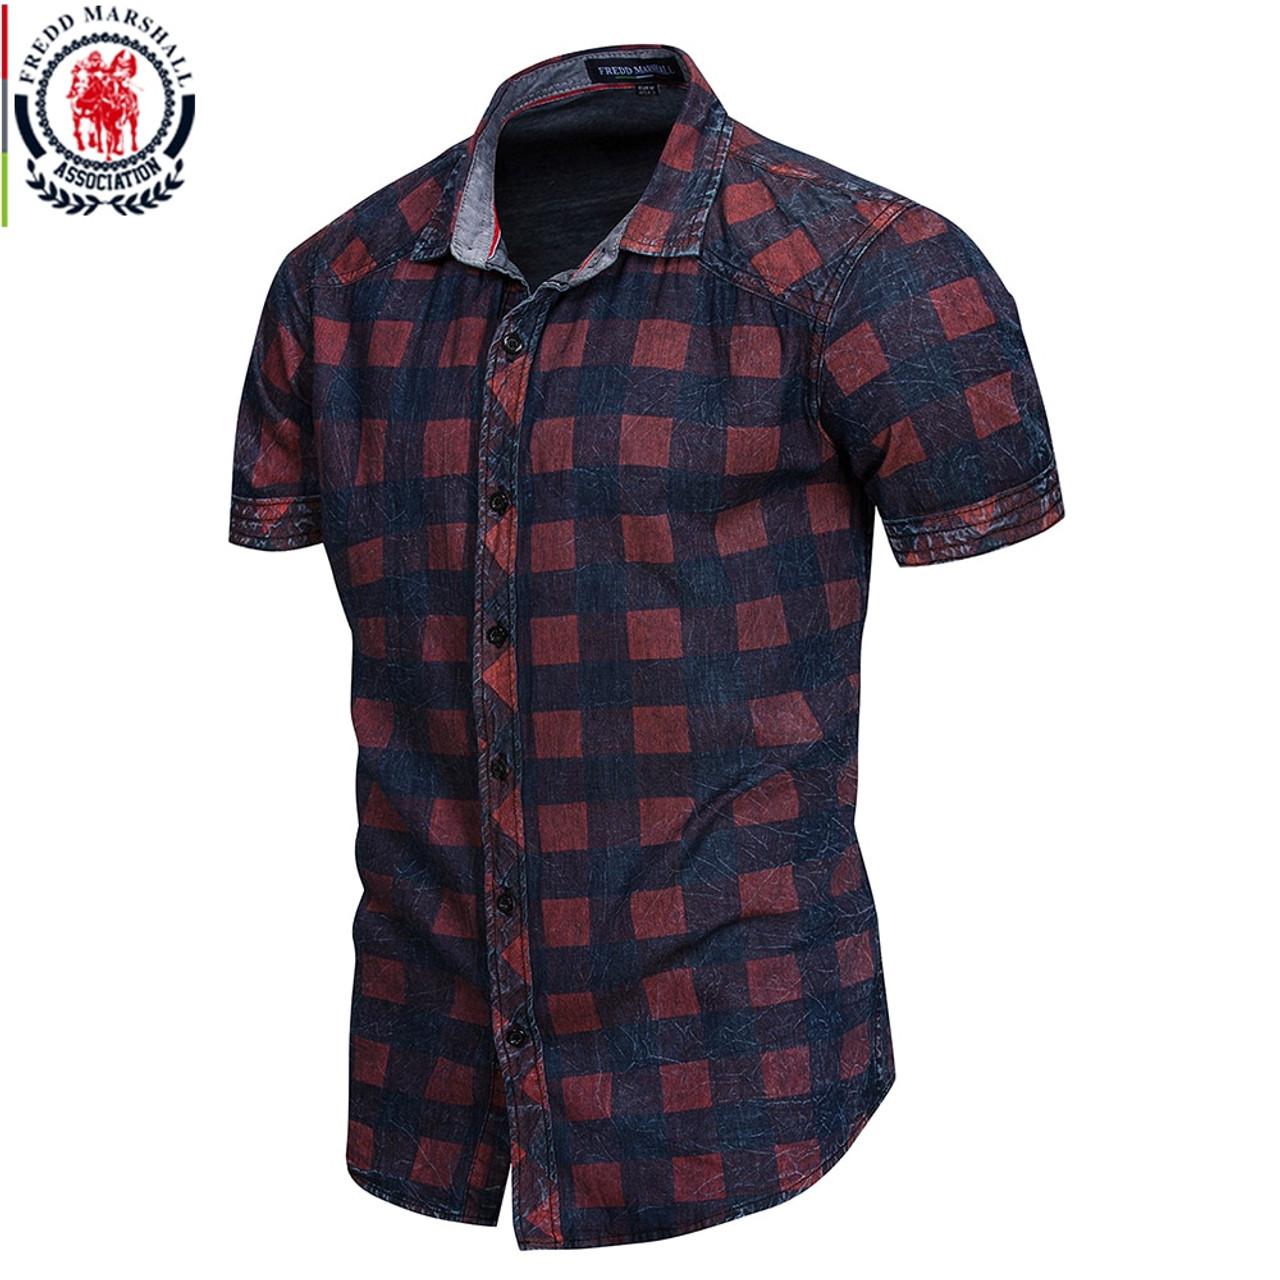 e1f78e6334b FREDD MARSHALL 2018 New Summer Short Sleeve Denim Shirt Men Casual Business Plaid  Shirts Male Brand ...